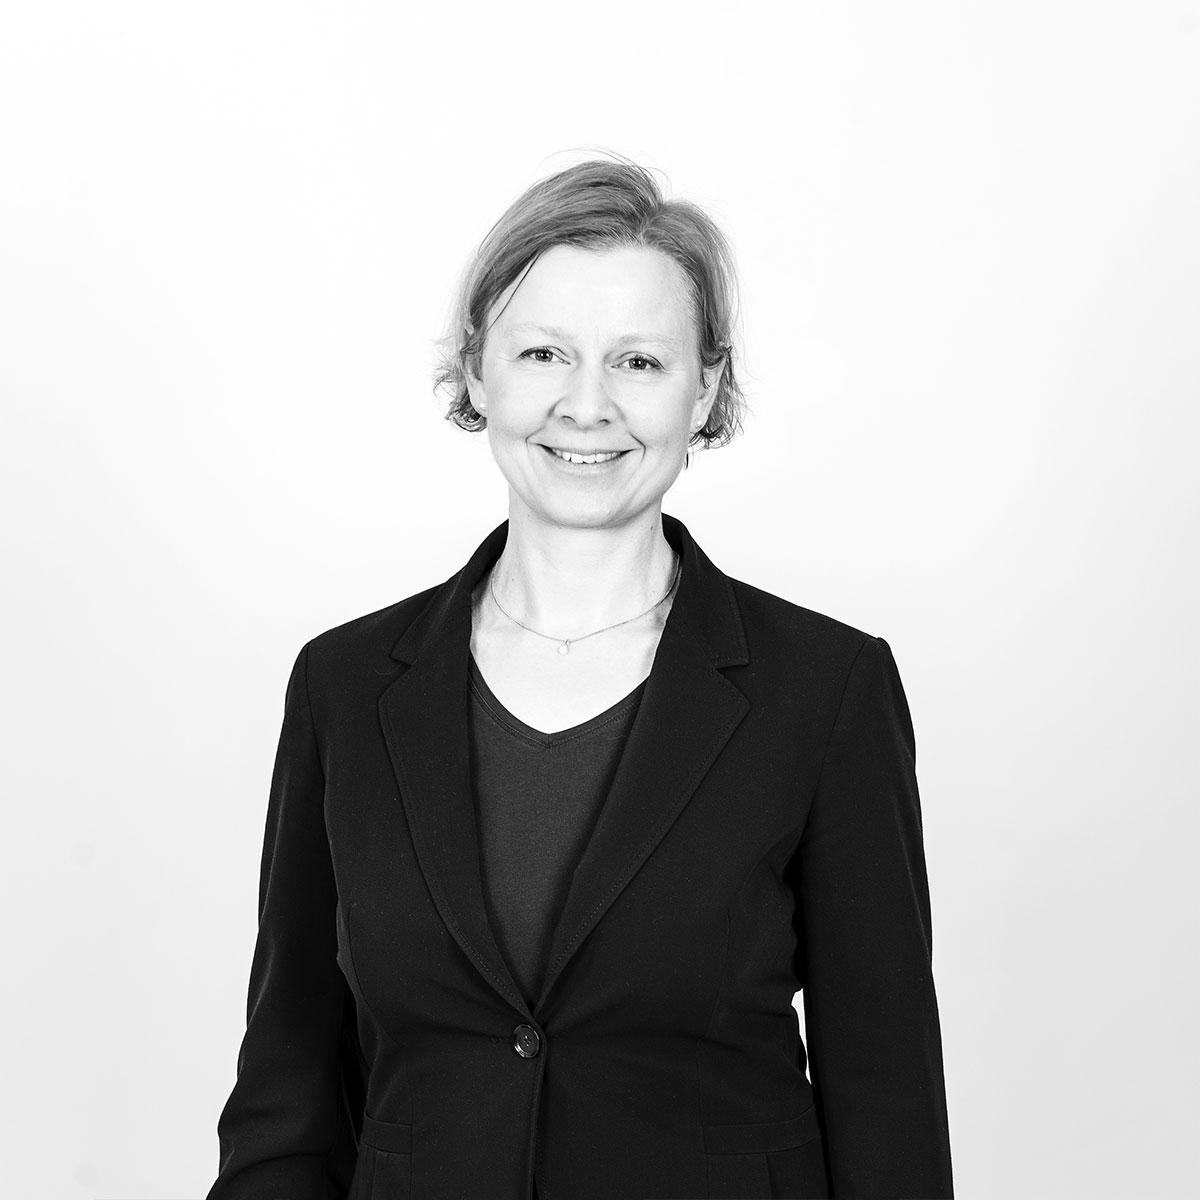 Dr. Anne-Kristin Borszik